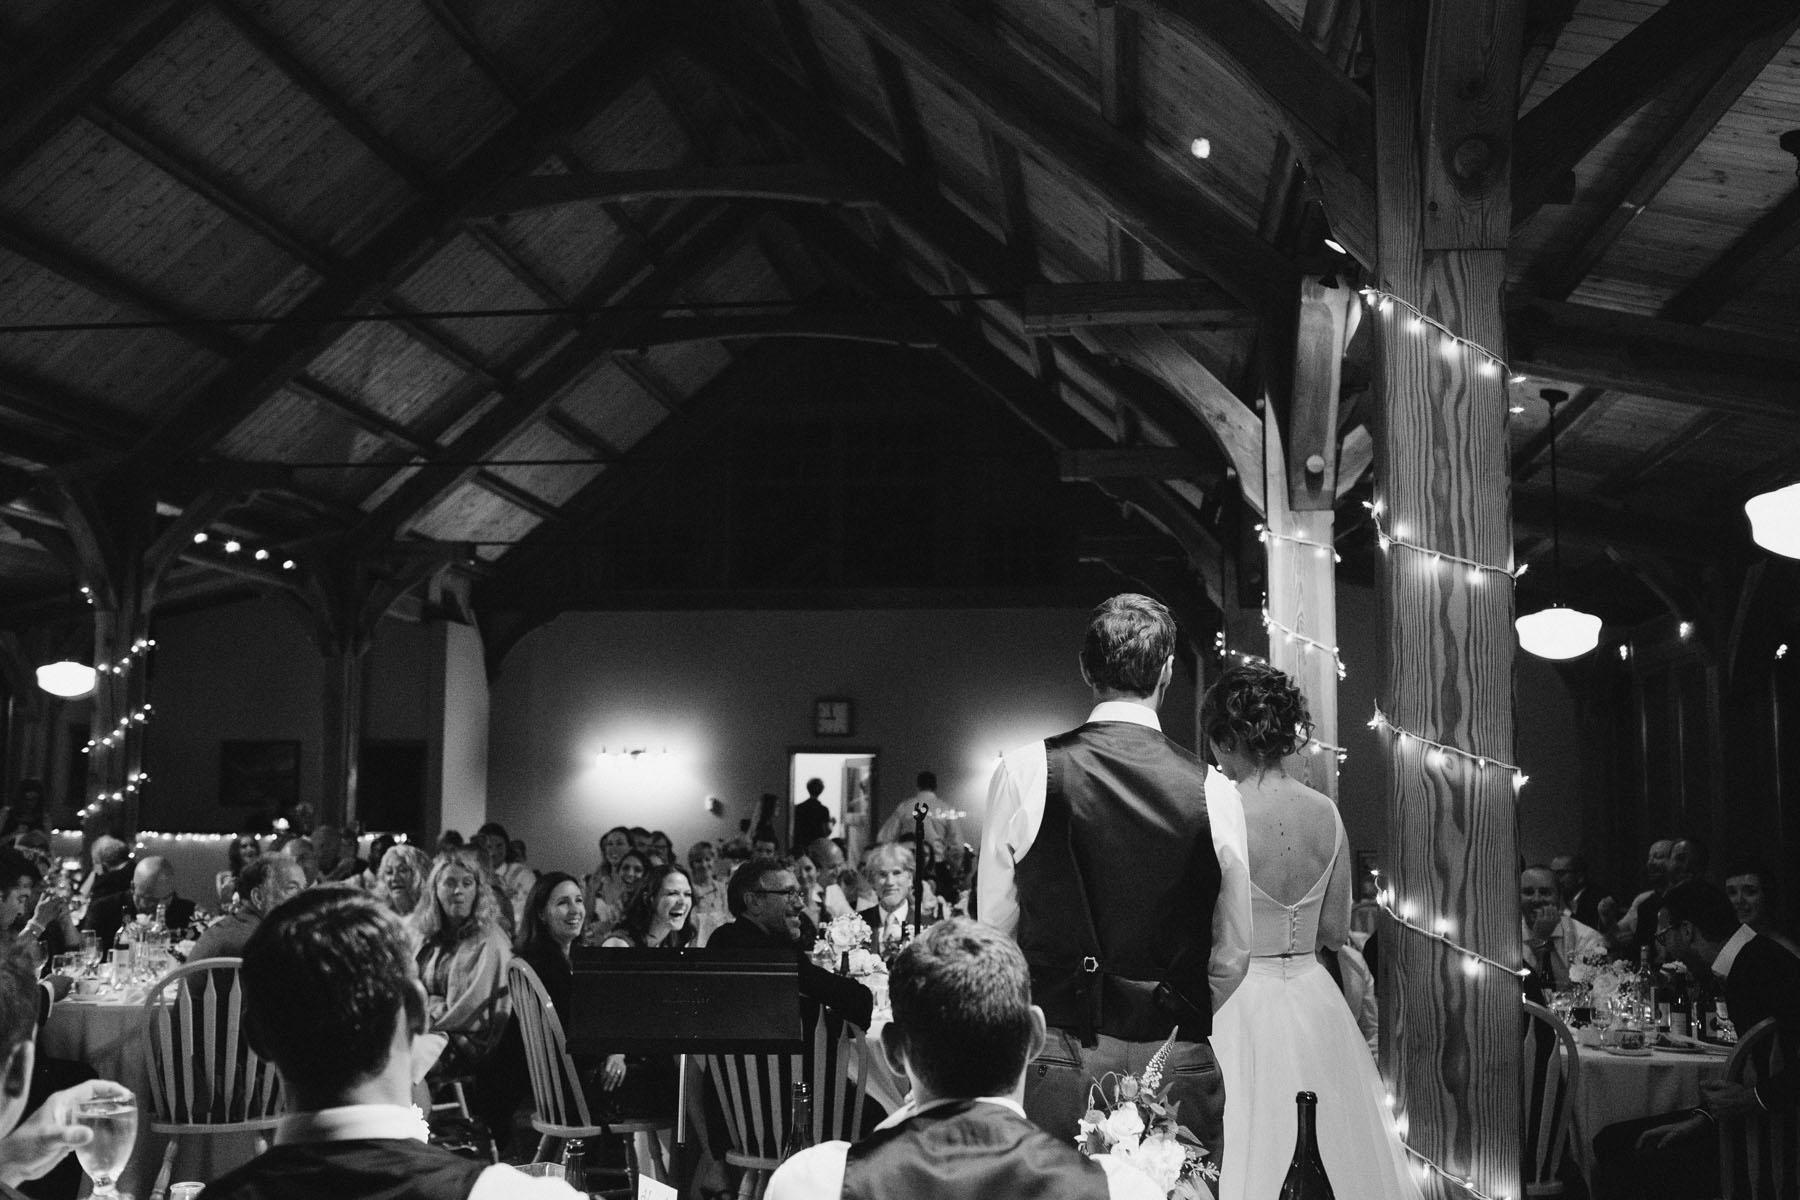 thetis-island-wedding-photographer-rp-rn-191.jpg